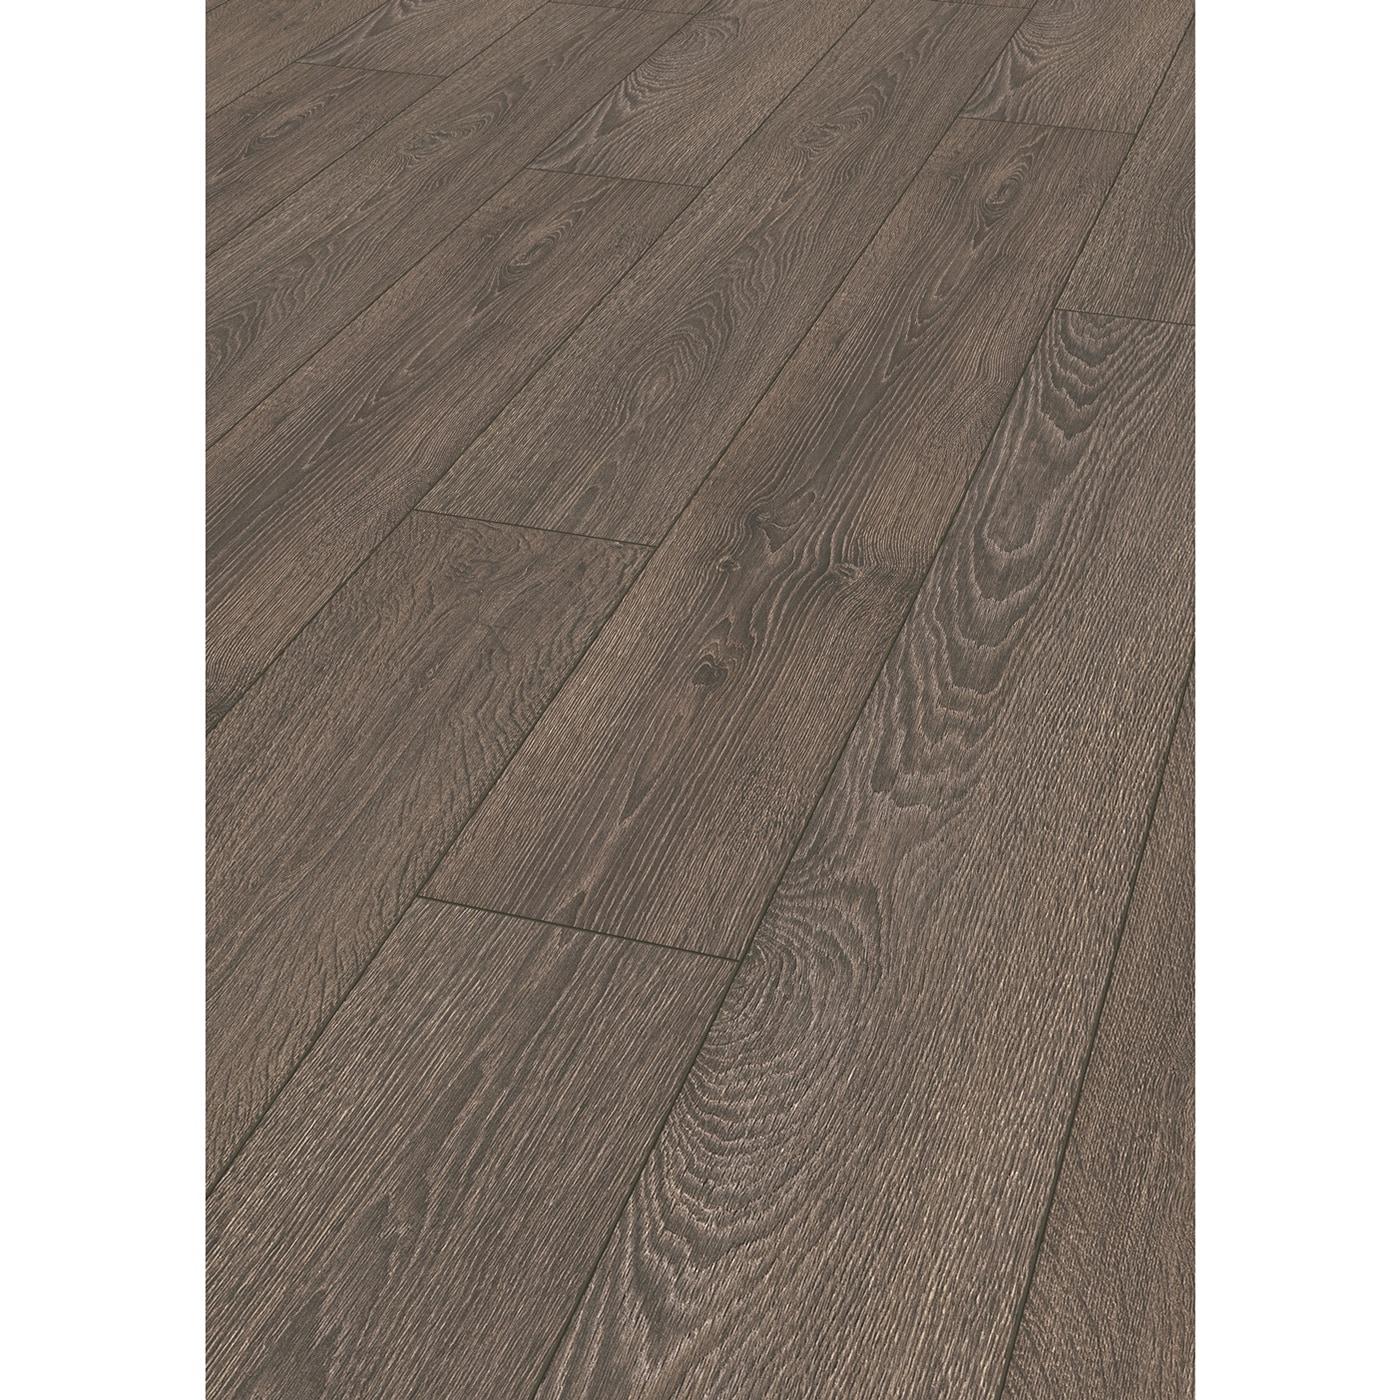 Kronotex laminate robusto 12 mm collection capital oak for Kronotex laminate flooring reviews